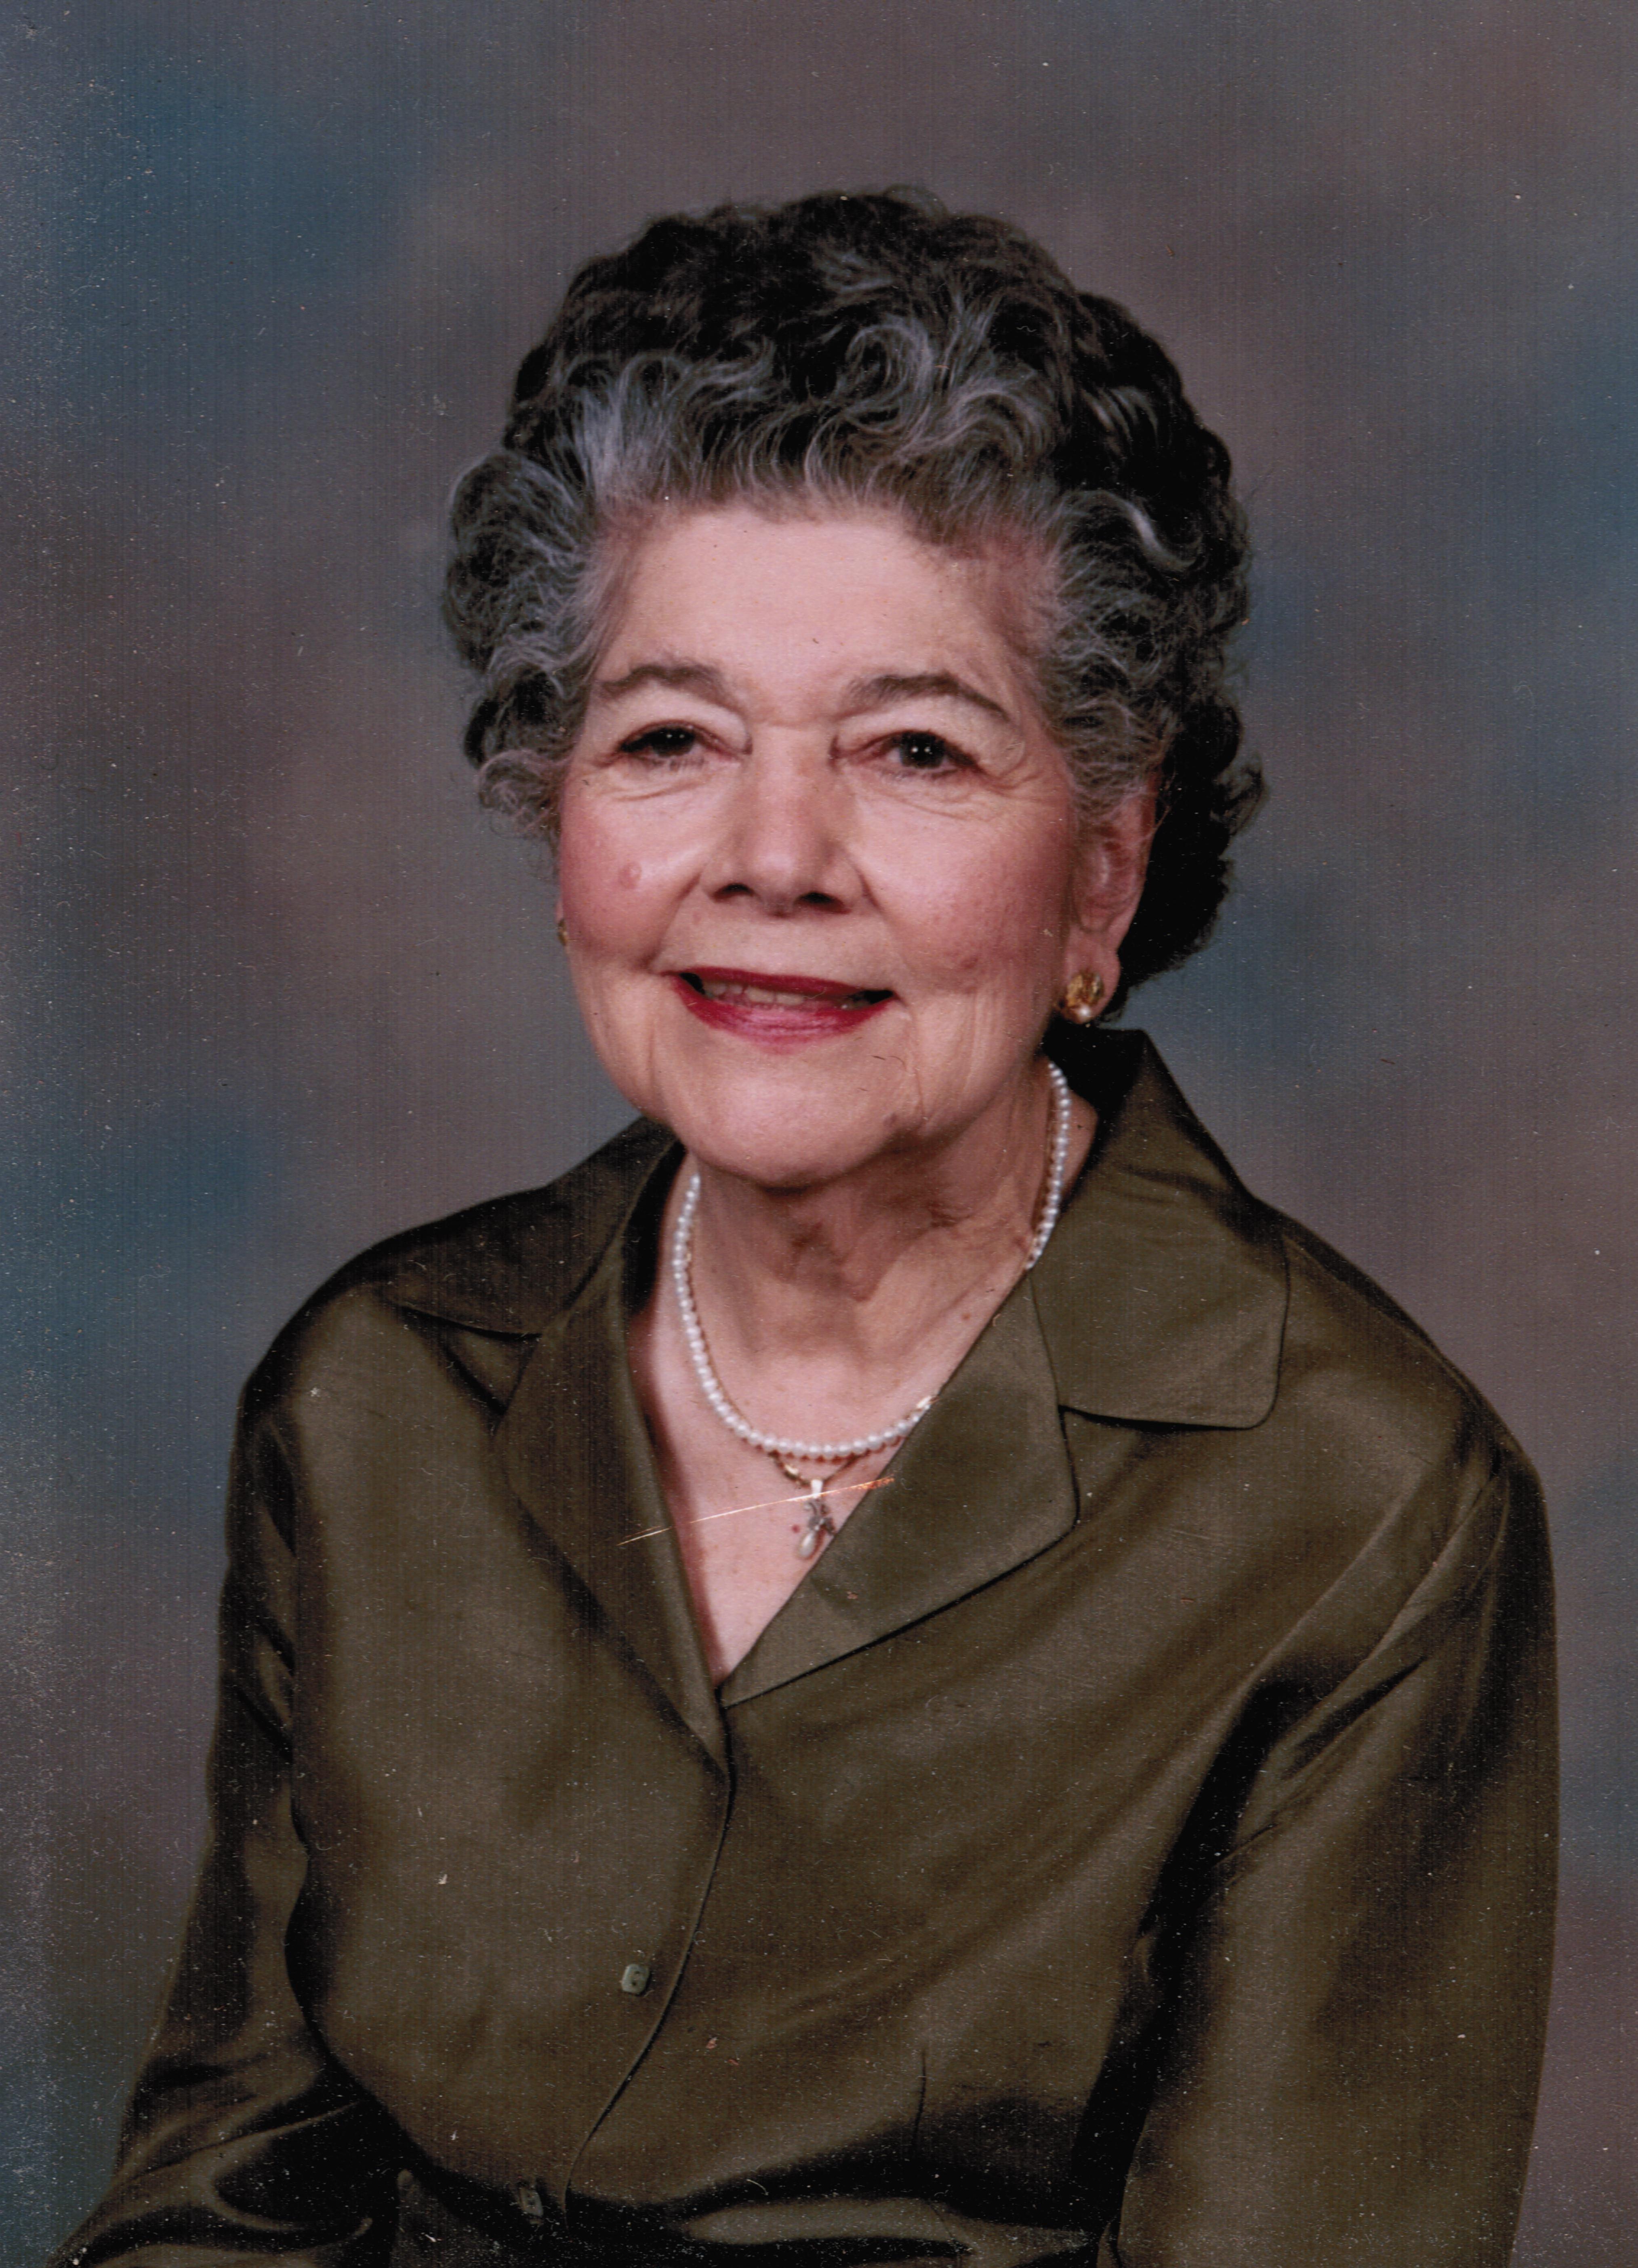 Rose Mary Pangburn Stahmer